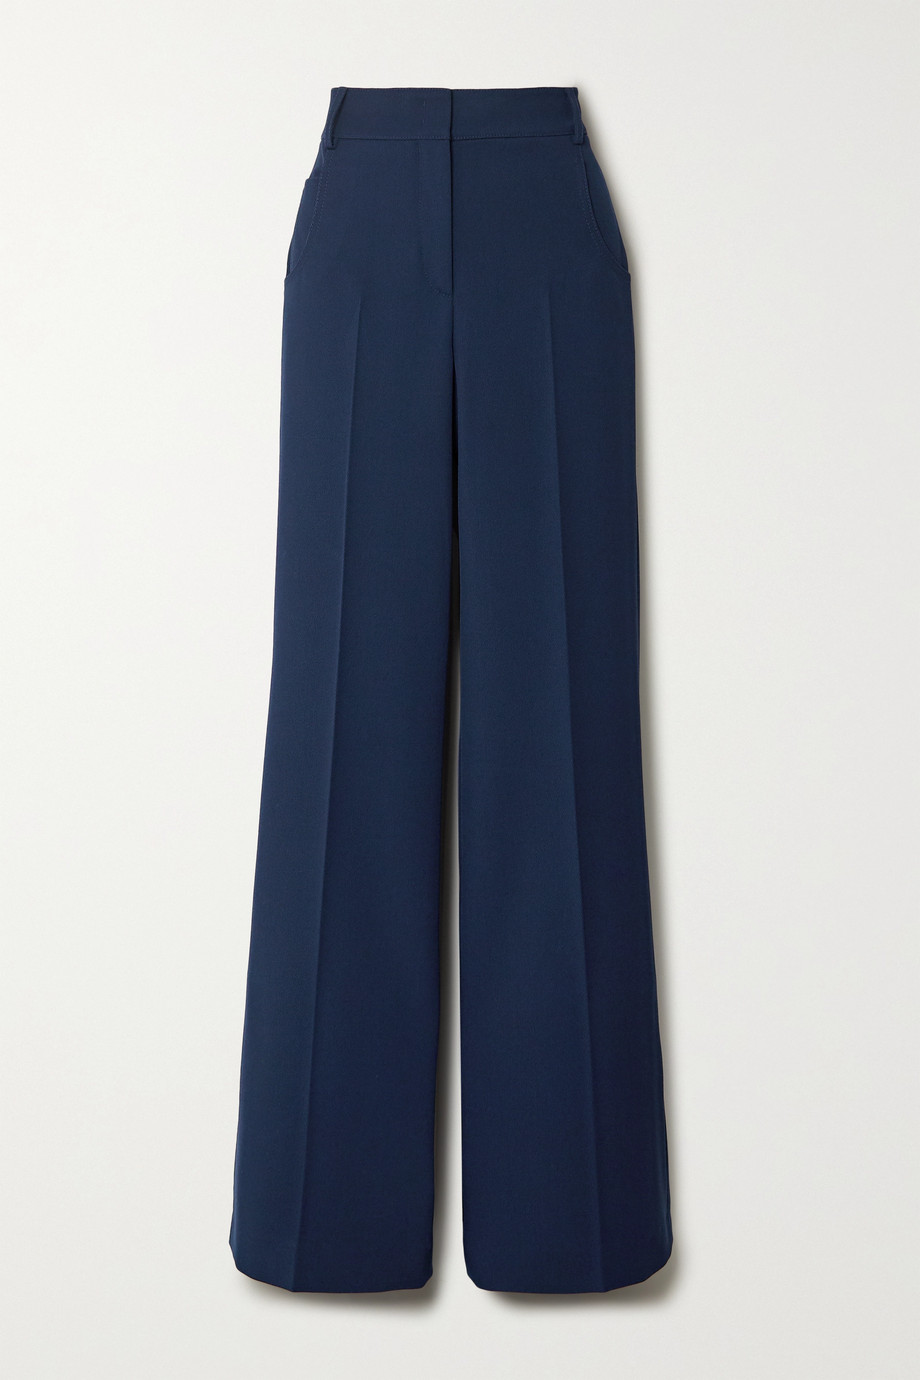 Akris Floyd wool-twill wide-leg pants